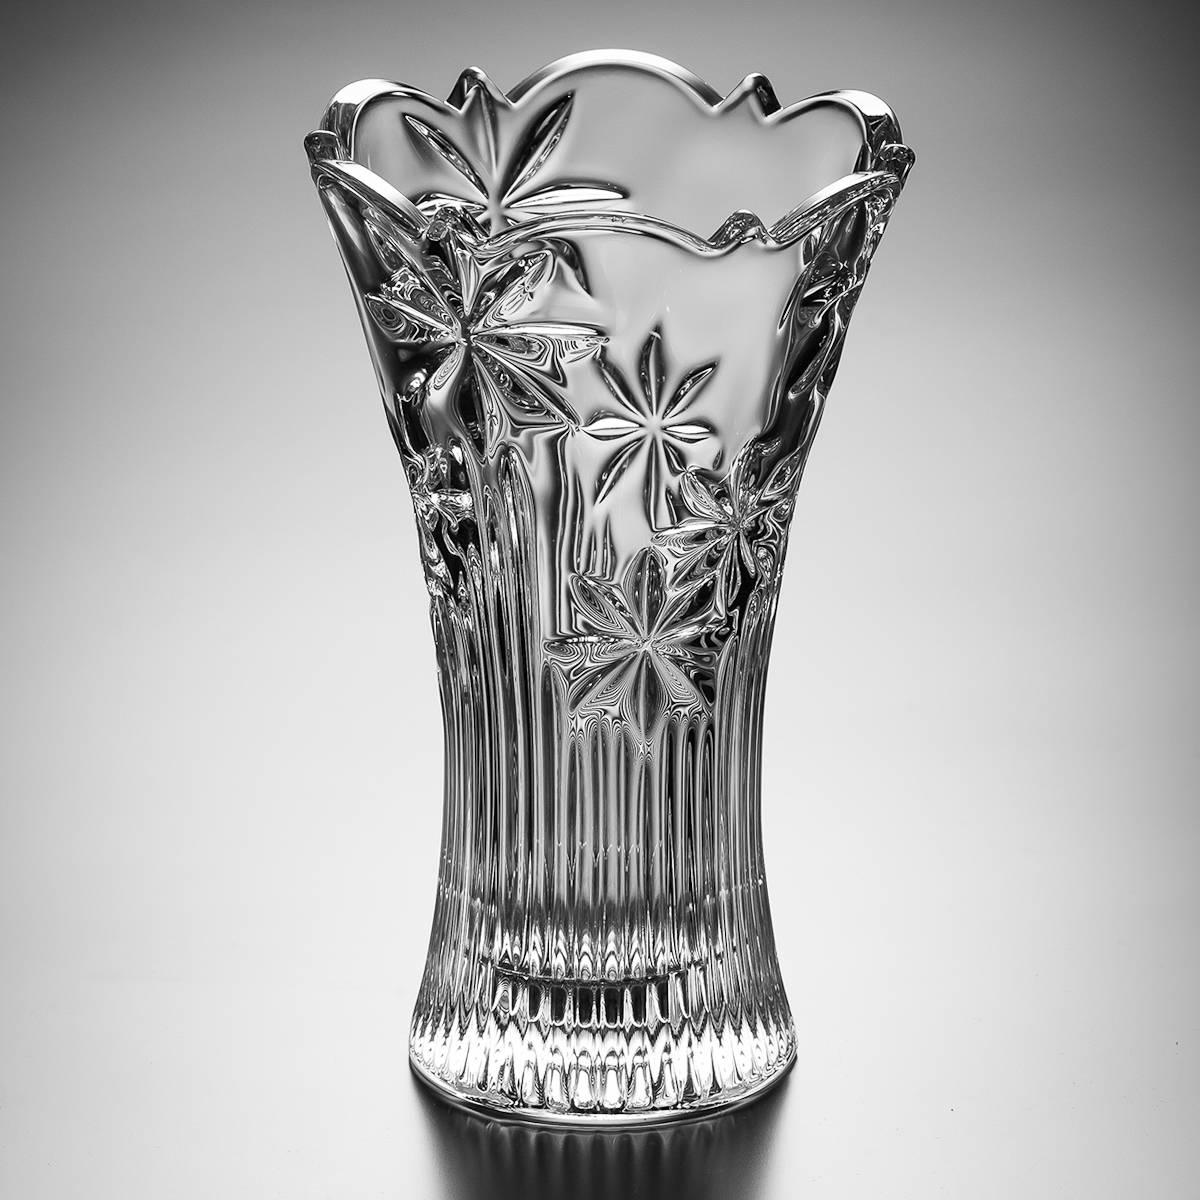 Vaso Acinturado Perseus em Cristal - Bohemia Crystalite - 30 cm